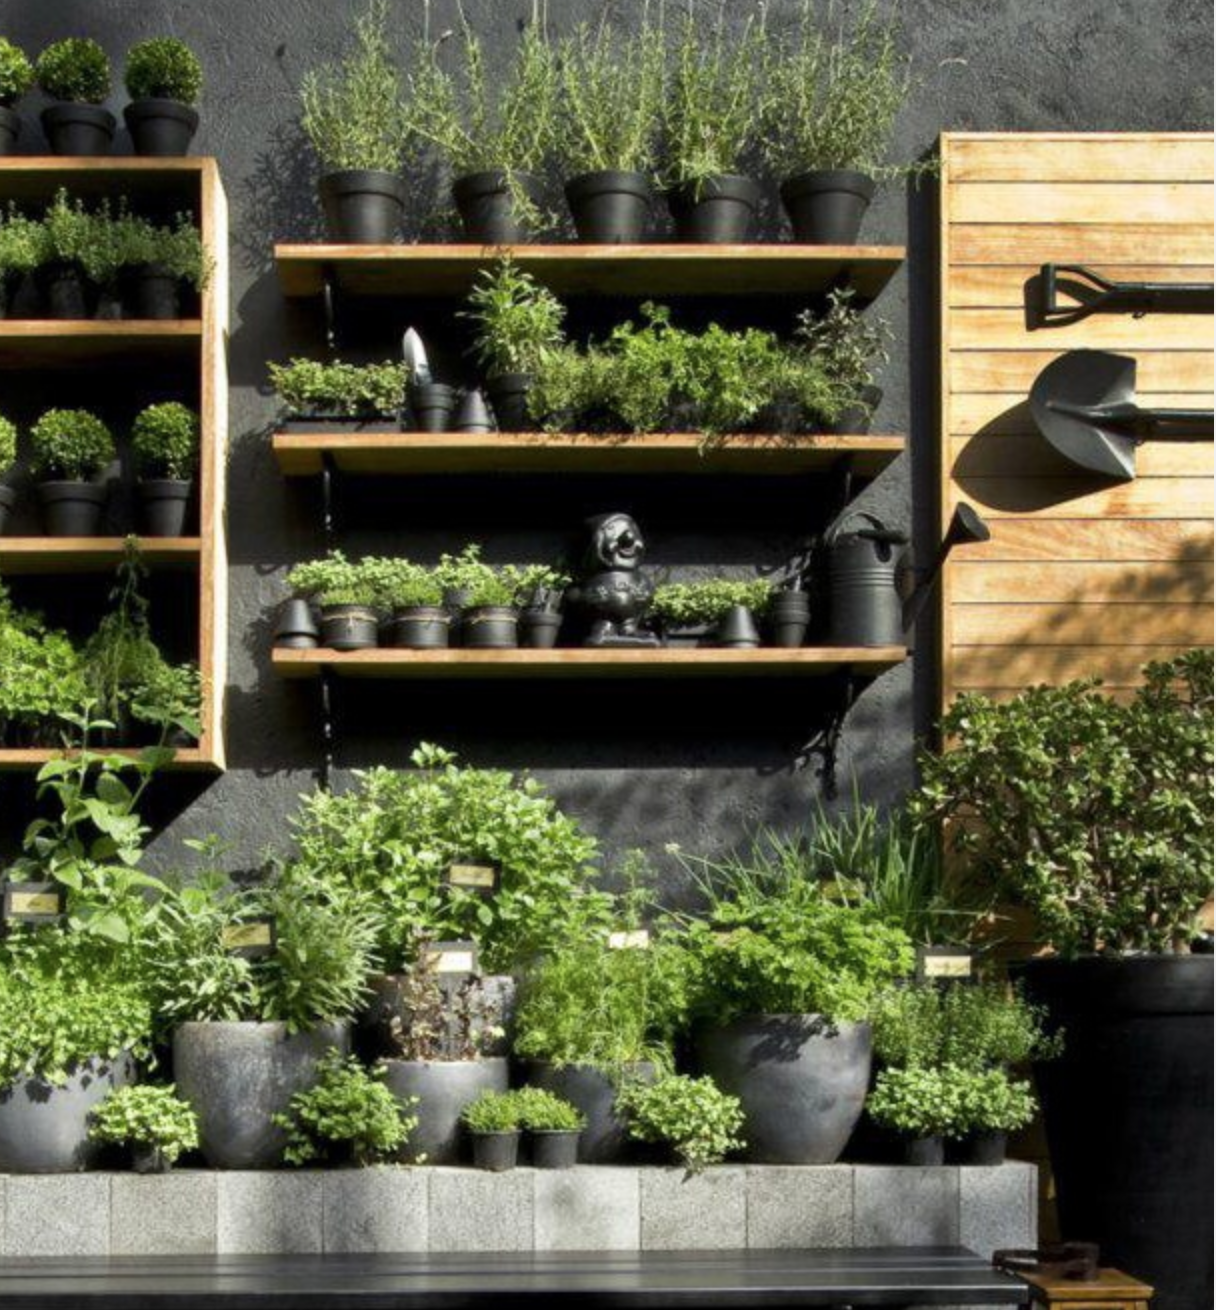 great planting